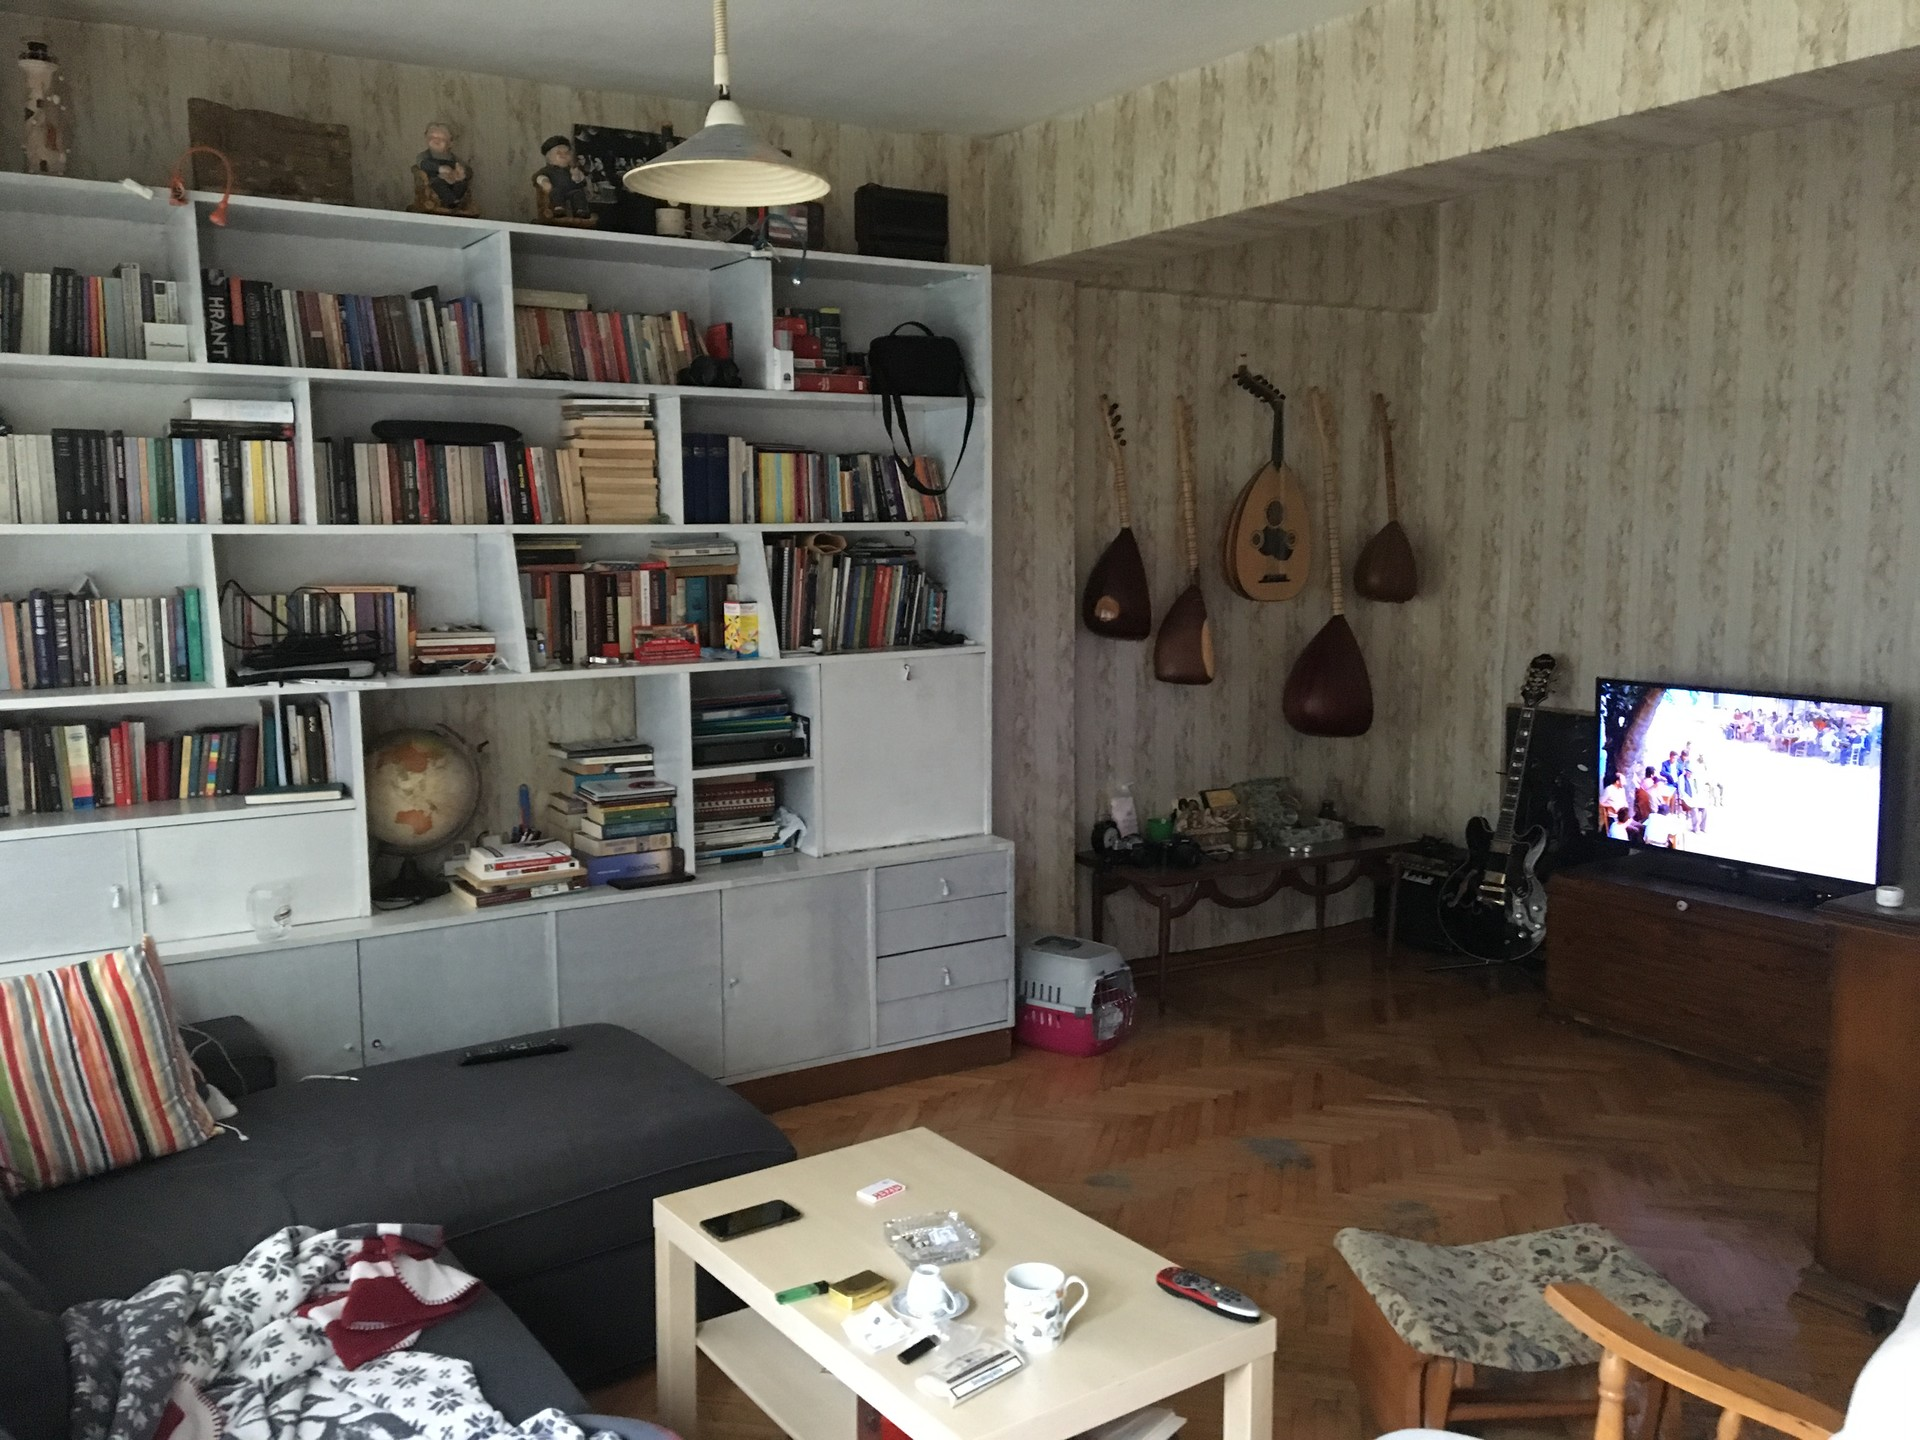 central-peaceful-flat-kadikoy-962de6dd294bf39d7336a7970c860ad7